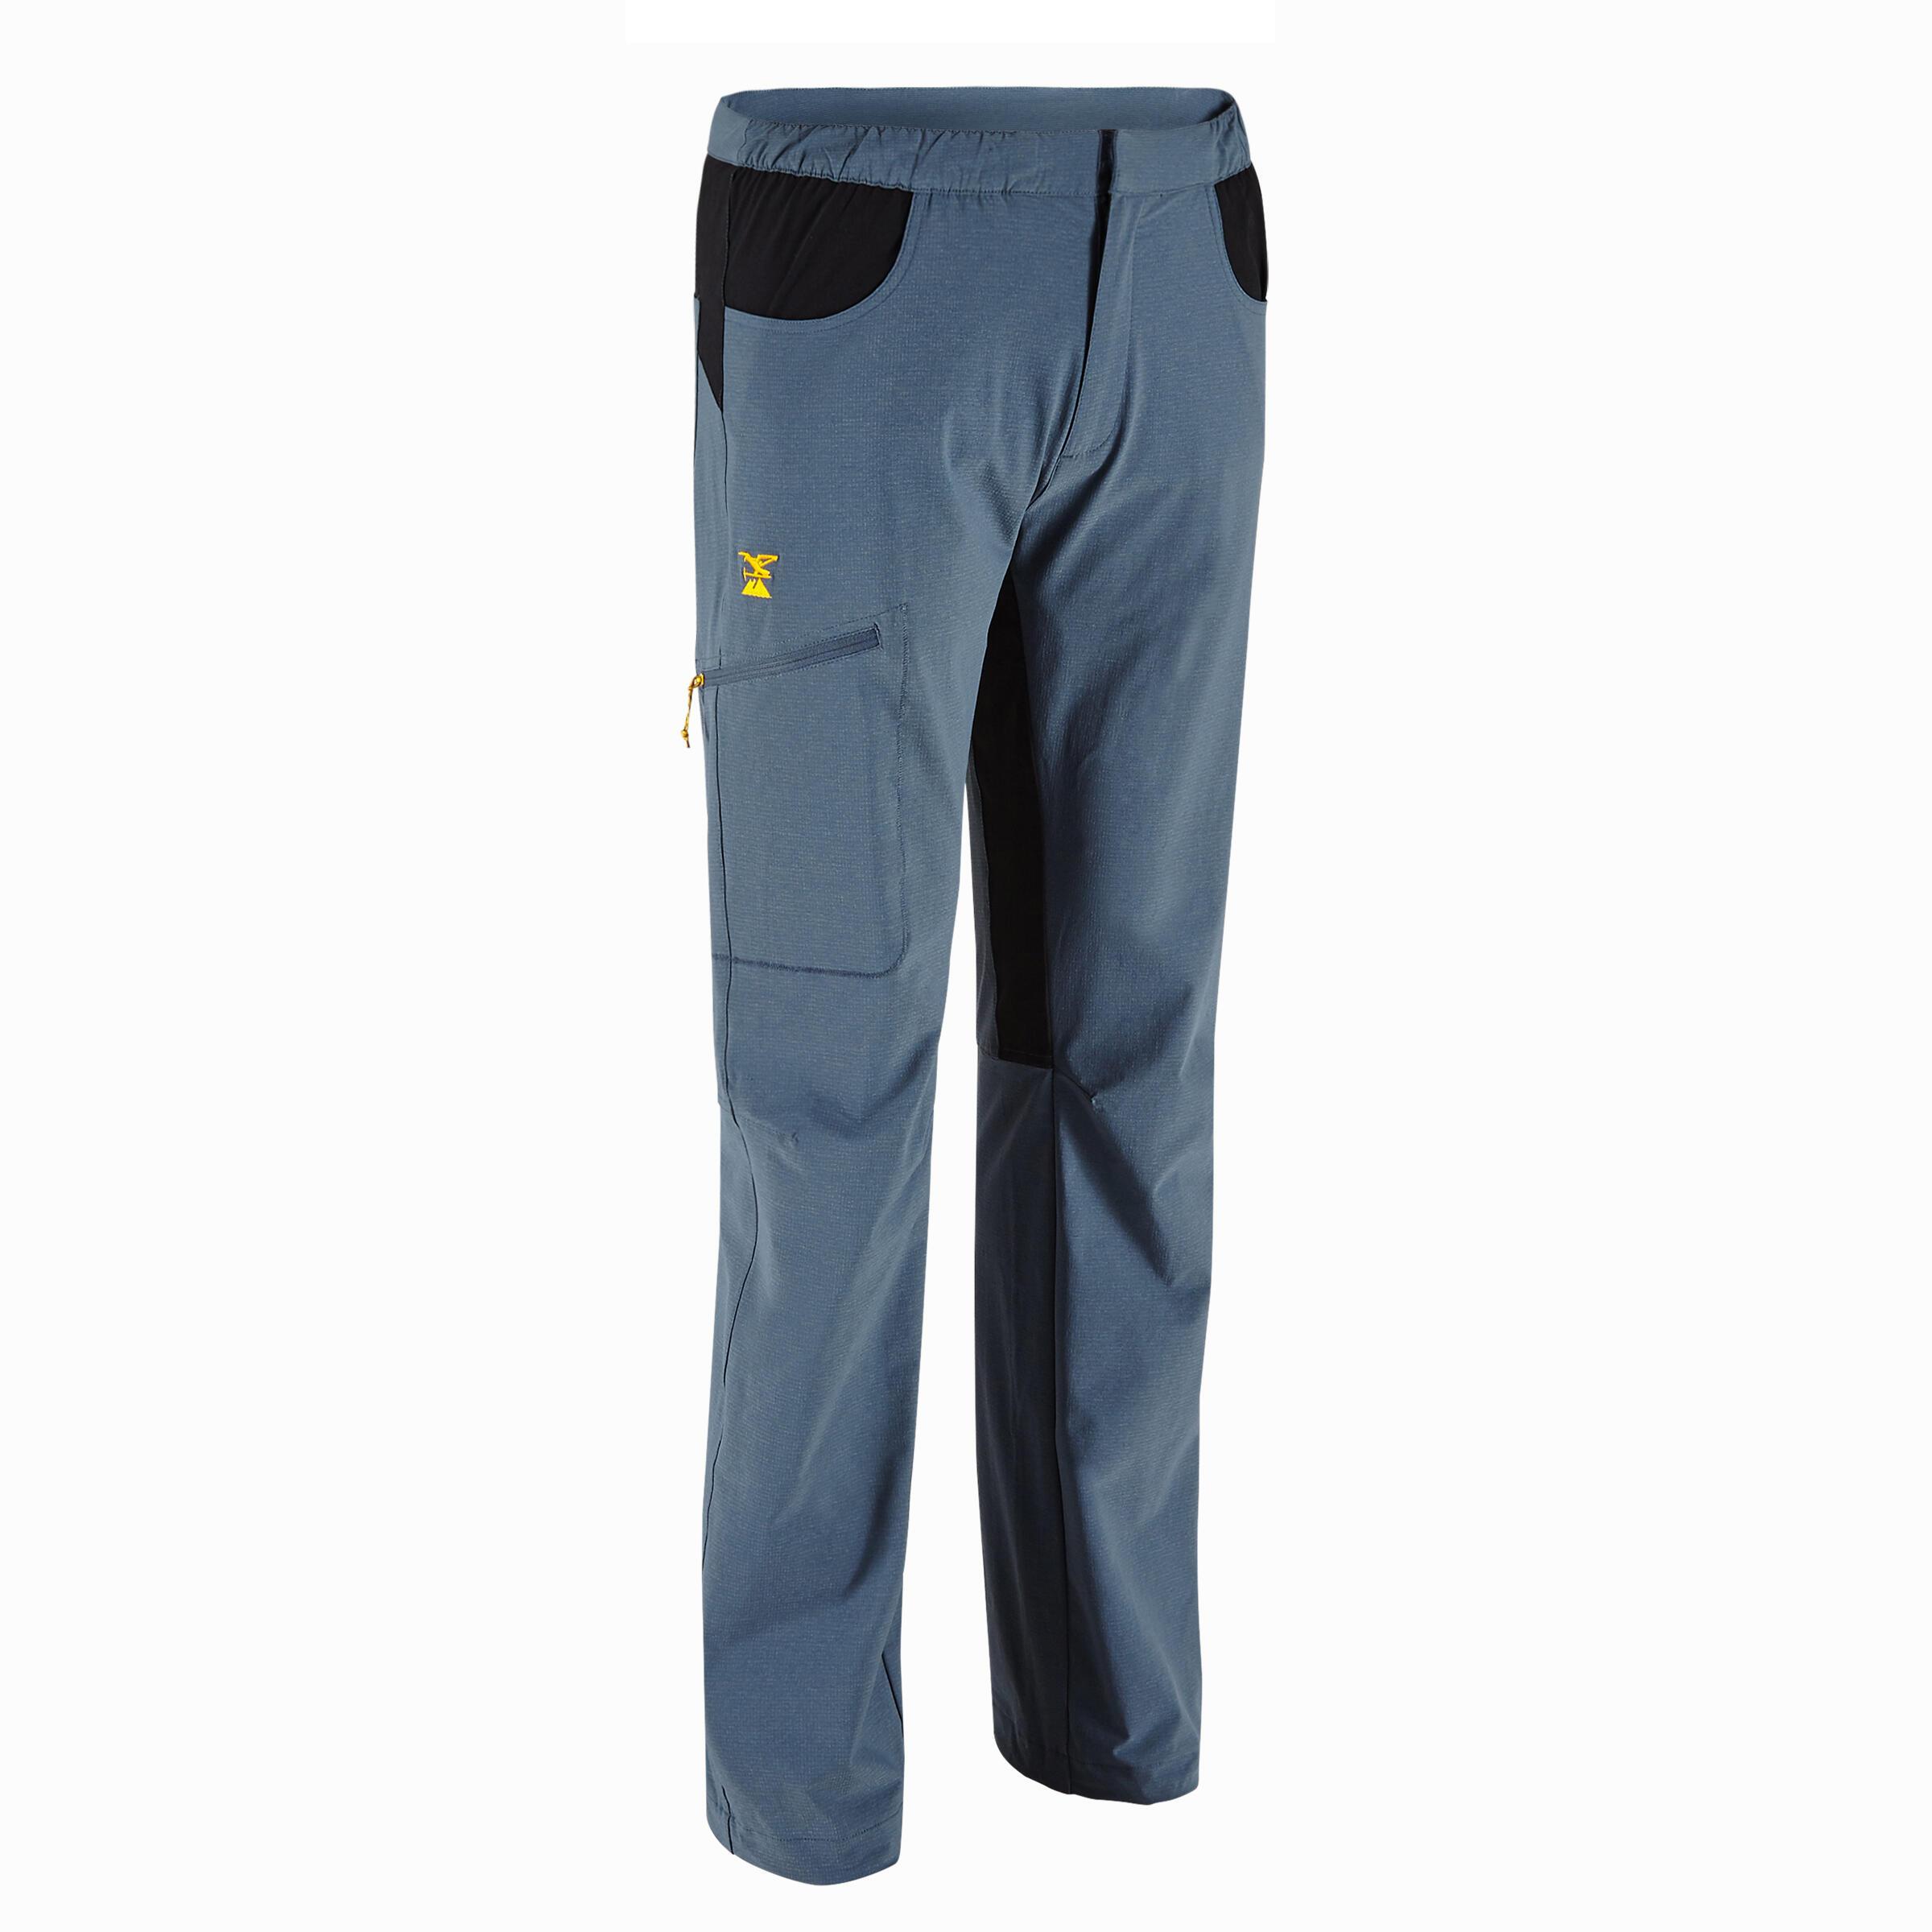 Kletterhose Funktionshose Stretch Herren | Sportbekleidung > Sporthosen > Sonstige Sporthosen | Simond